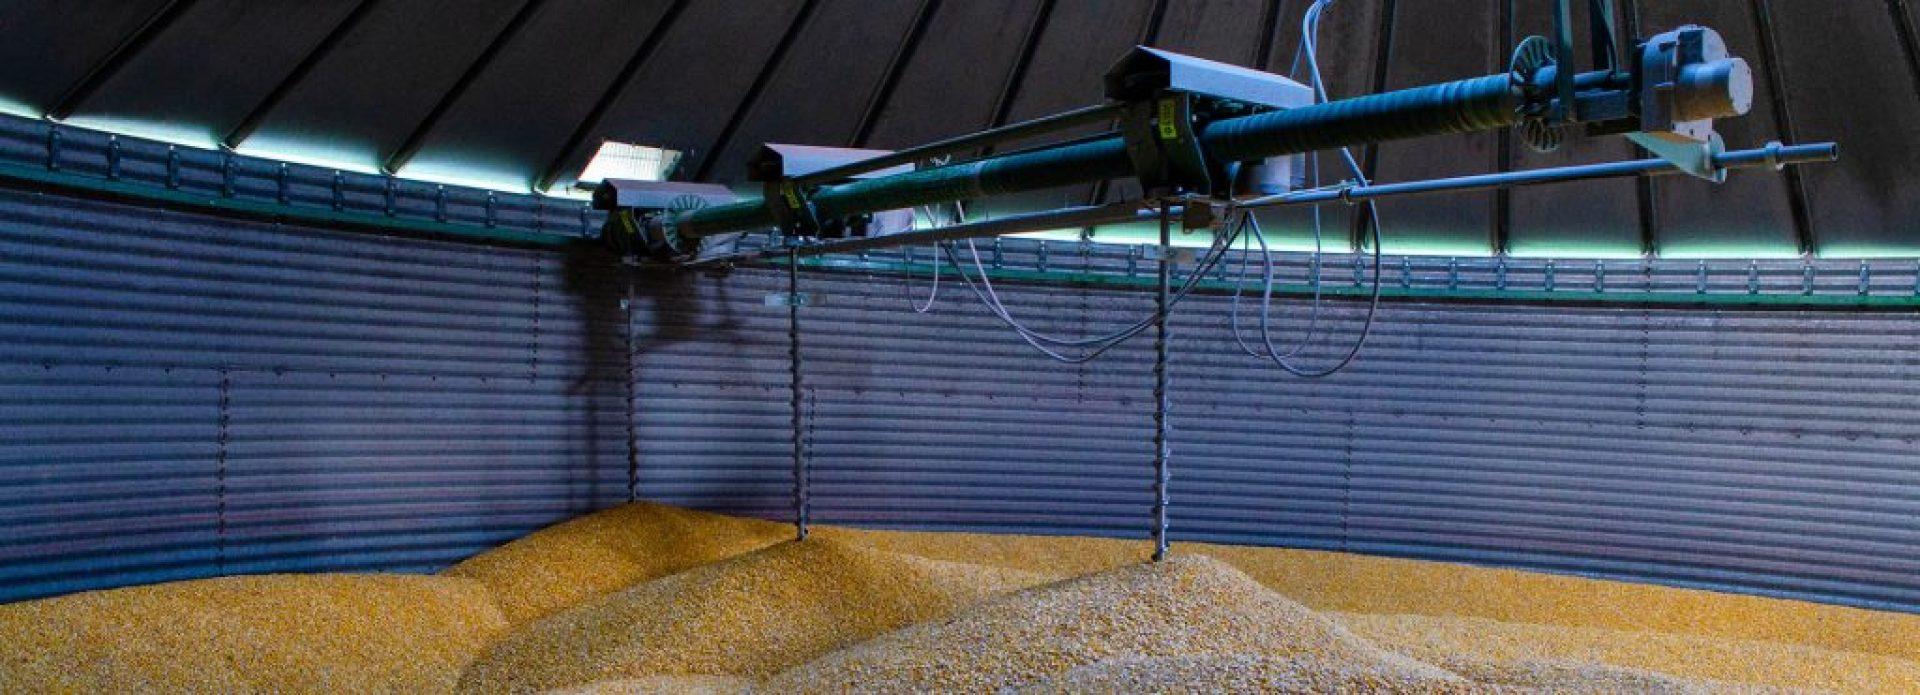 Eldon-C-Stutsman-Inc-Grain-Handling-Stirrator